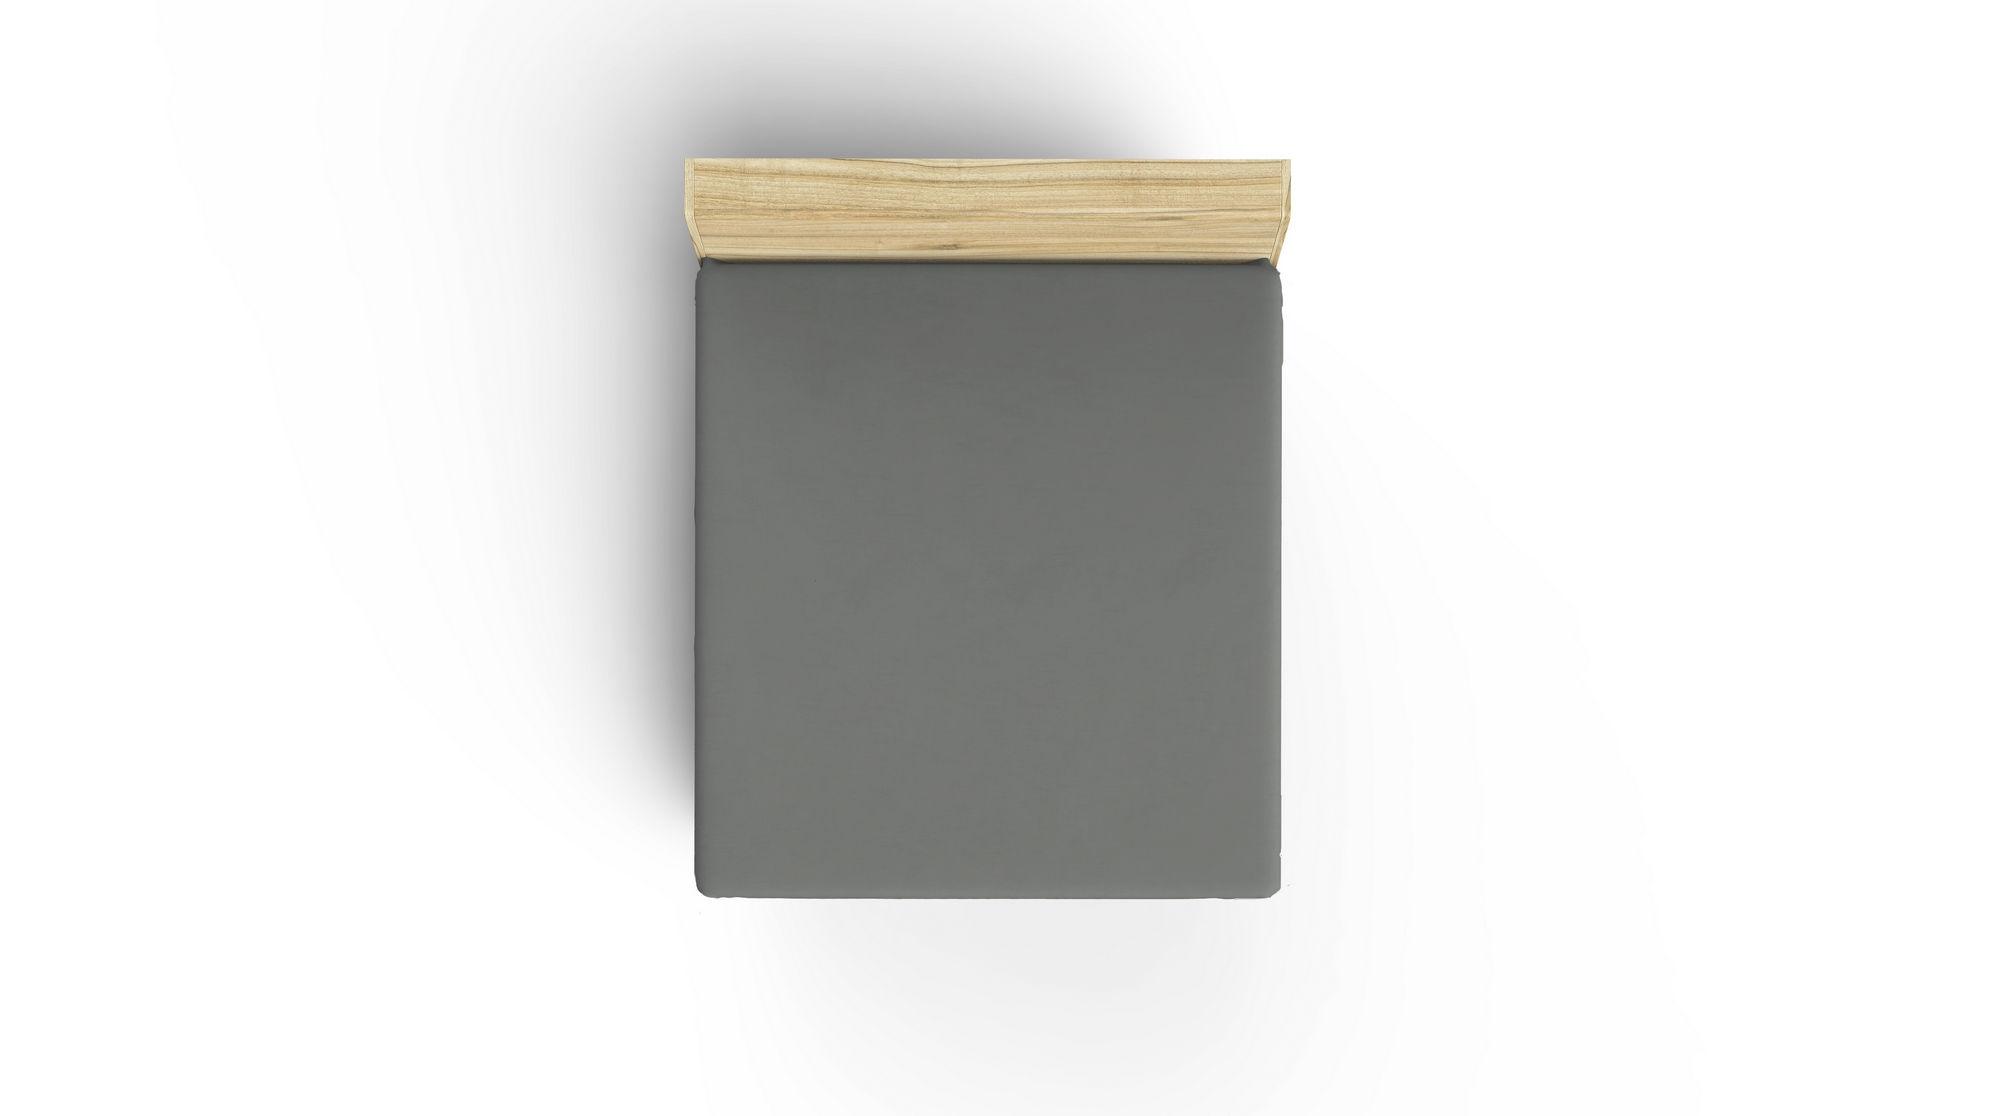 Cearceaf din bumbac Ranforce, King Gri Inchis, 160 x 200 cm imagine 2021